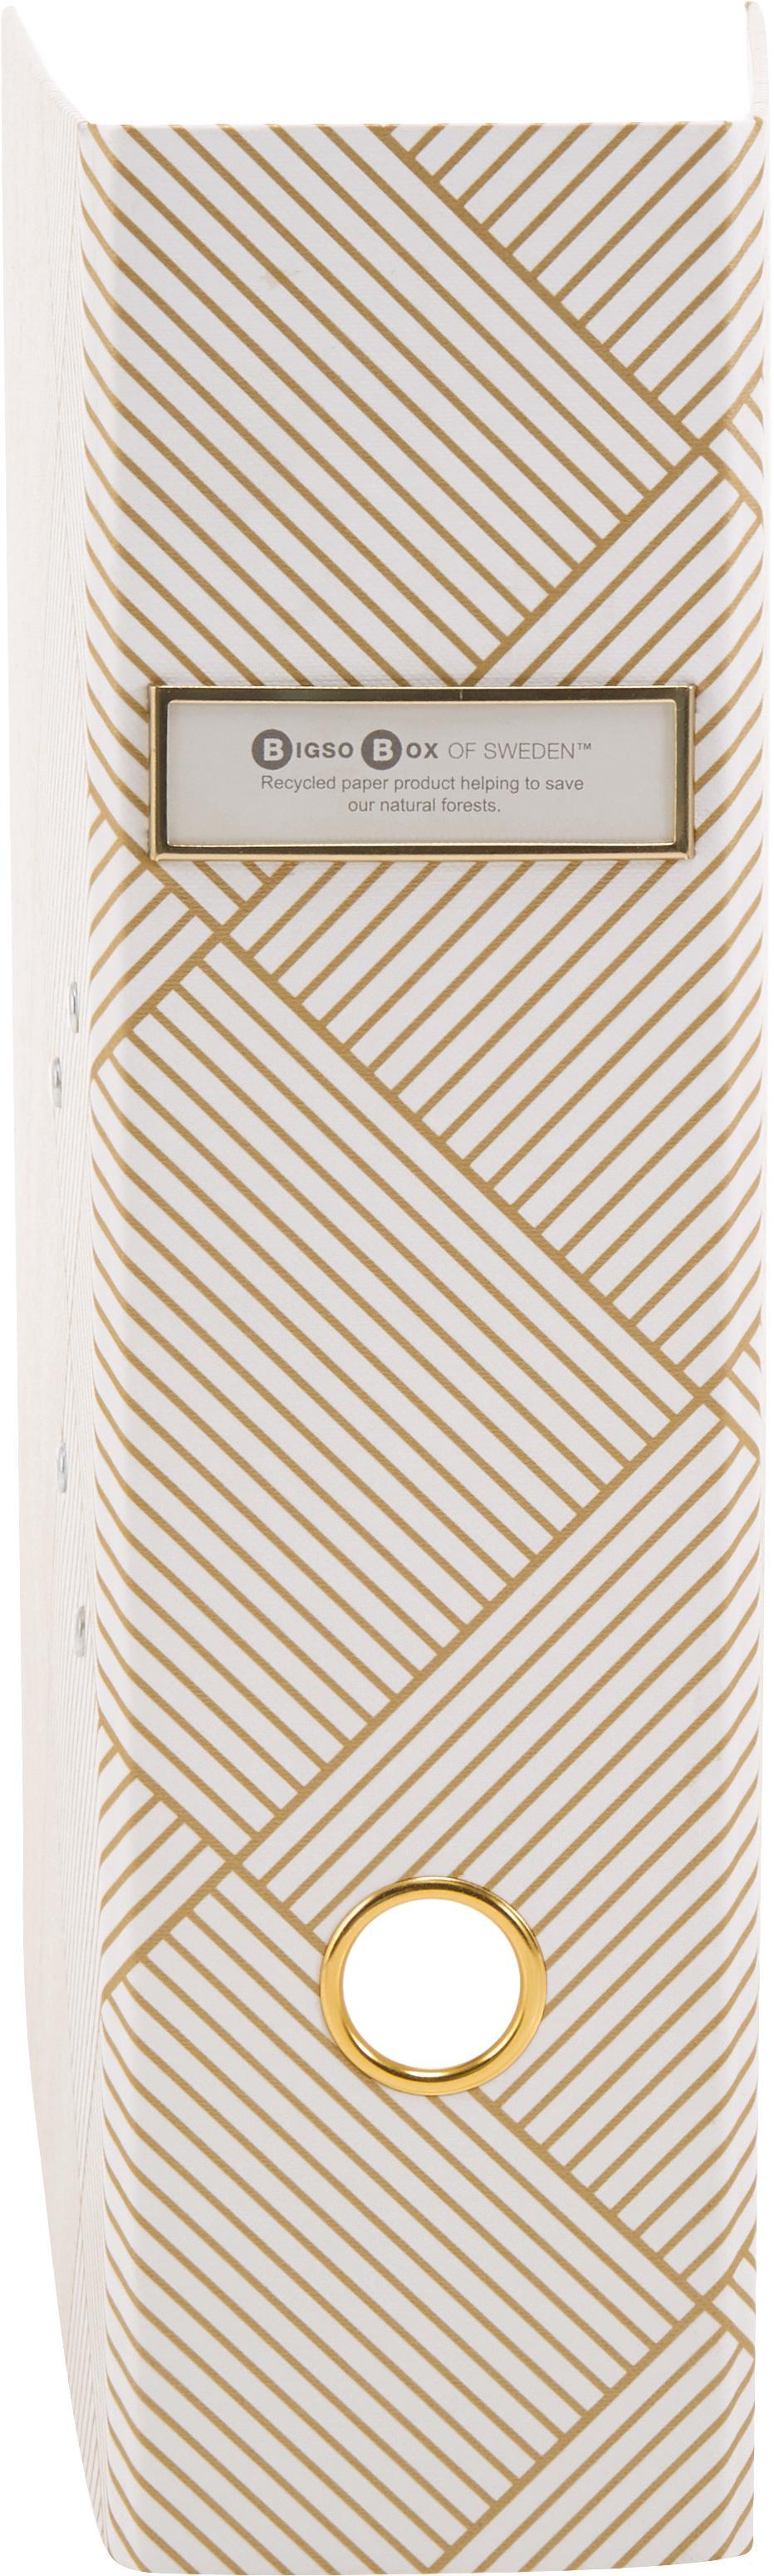 Cartella portadocumenti Archie, Dorato, bianco, Larg. 29 x Alt. 32 cm